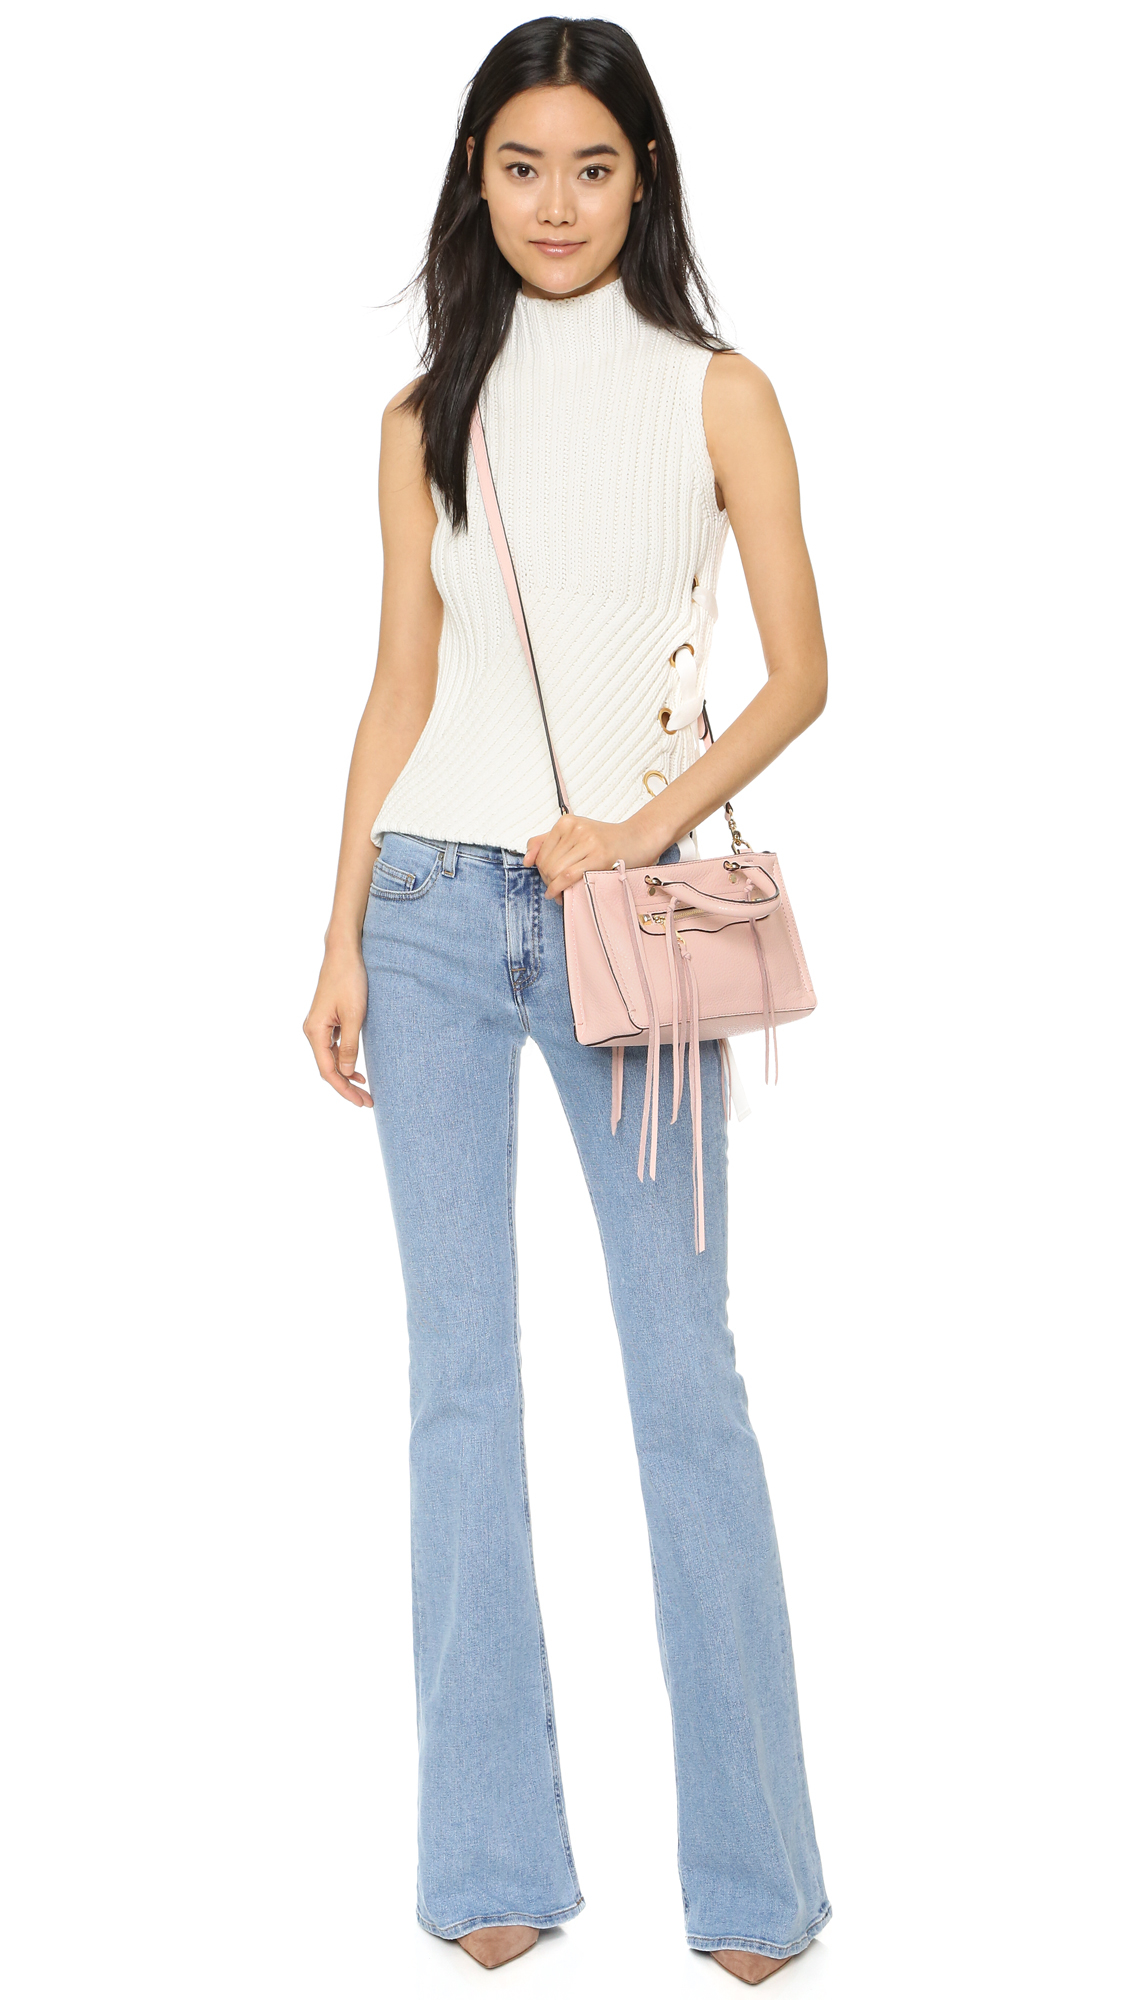 rebecca-minkoff-baby-pink-micro-regan-satchel-baby-pink-product-3-464792231-normal.jpeg